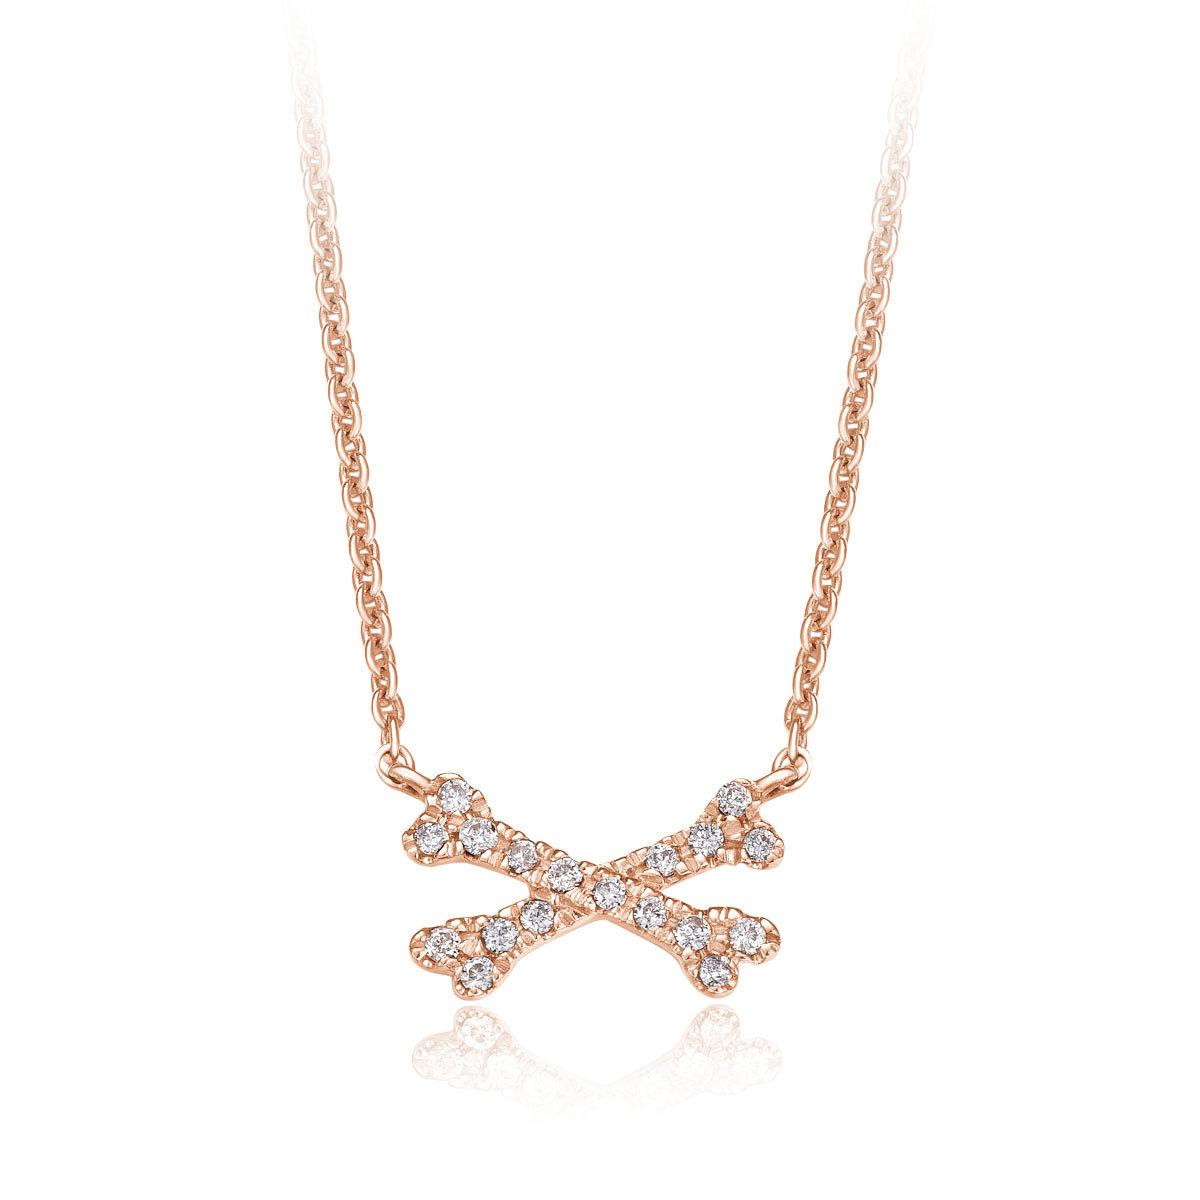 18K/750玫瑰色黃金鑲天然鑽石頸鍊